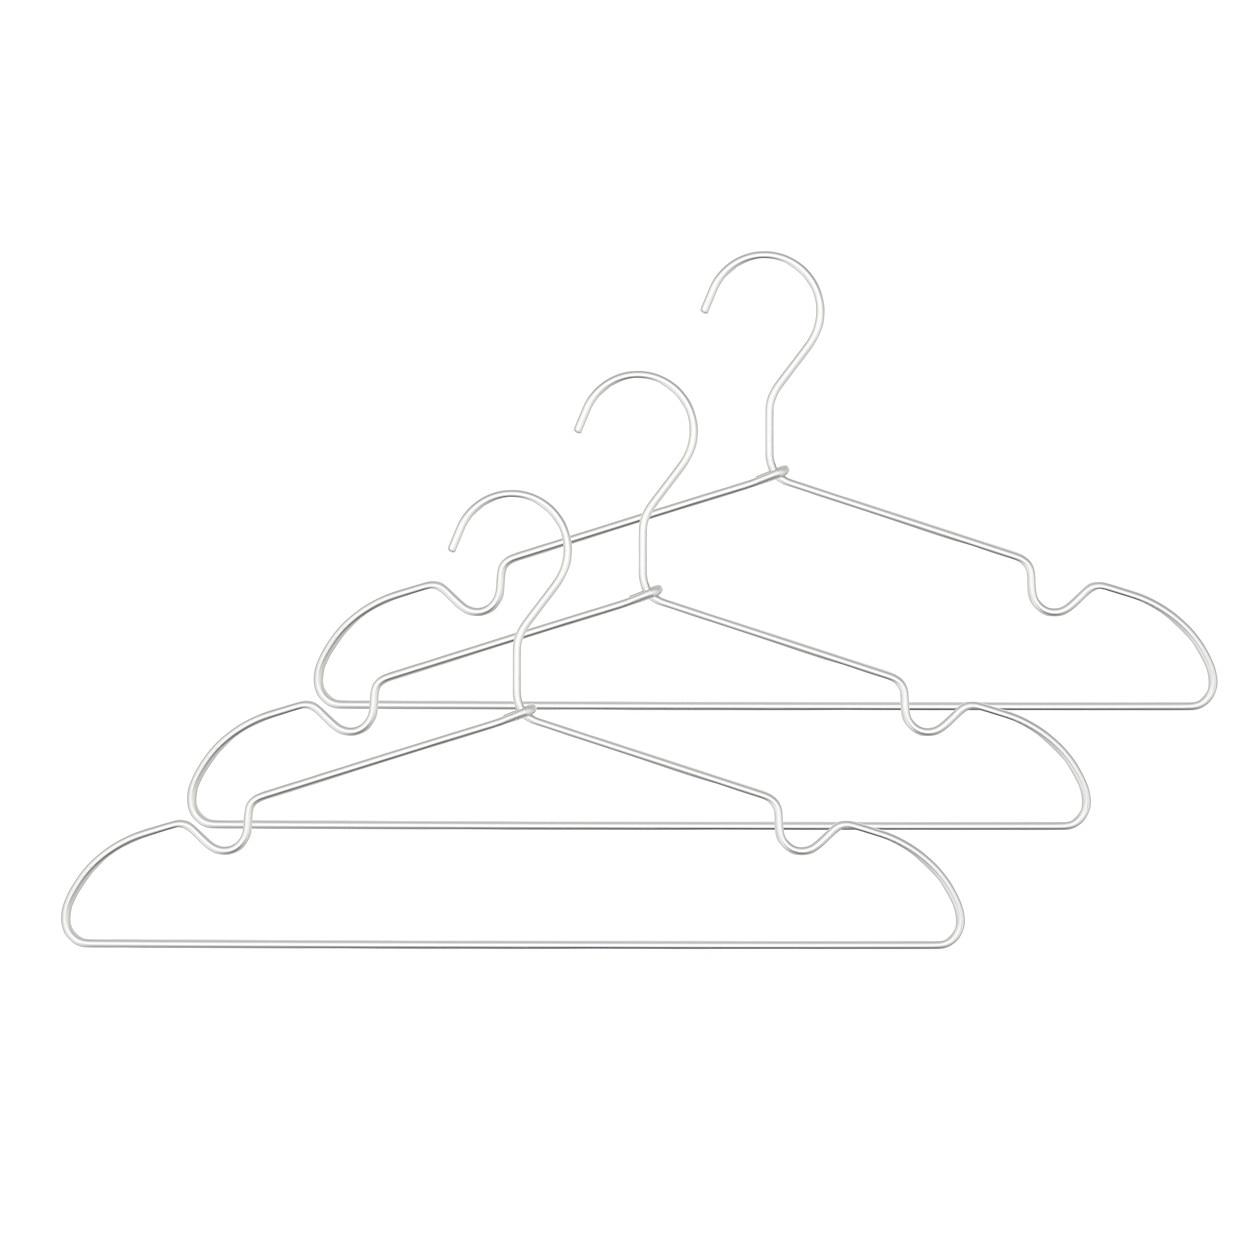 RoomClip商品情報 - 【まとめ買い】アルミ洗濯用ハンガー・肩ひもタイプ・3本組